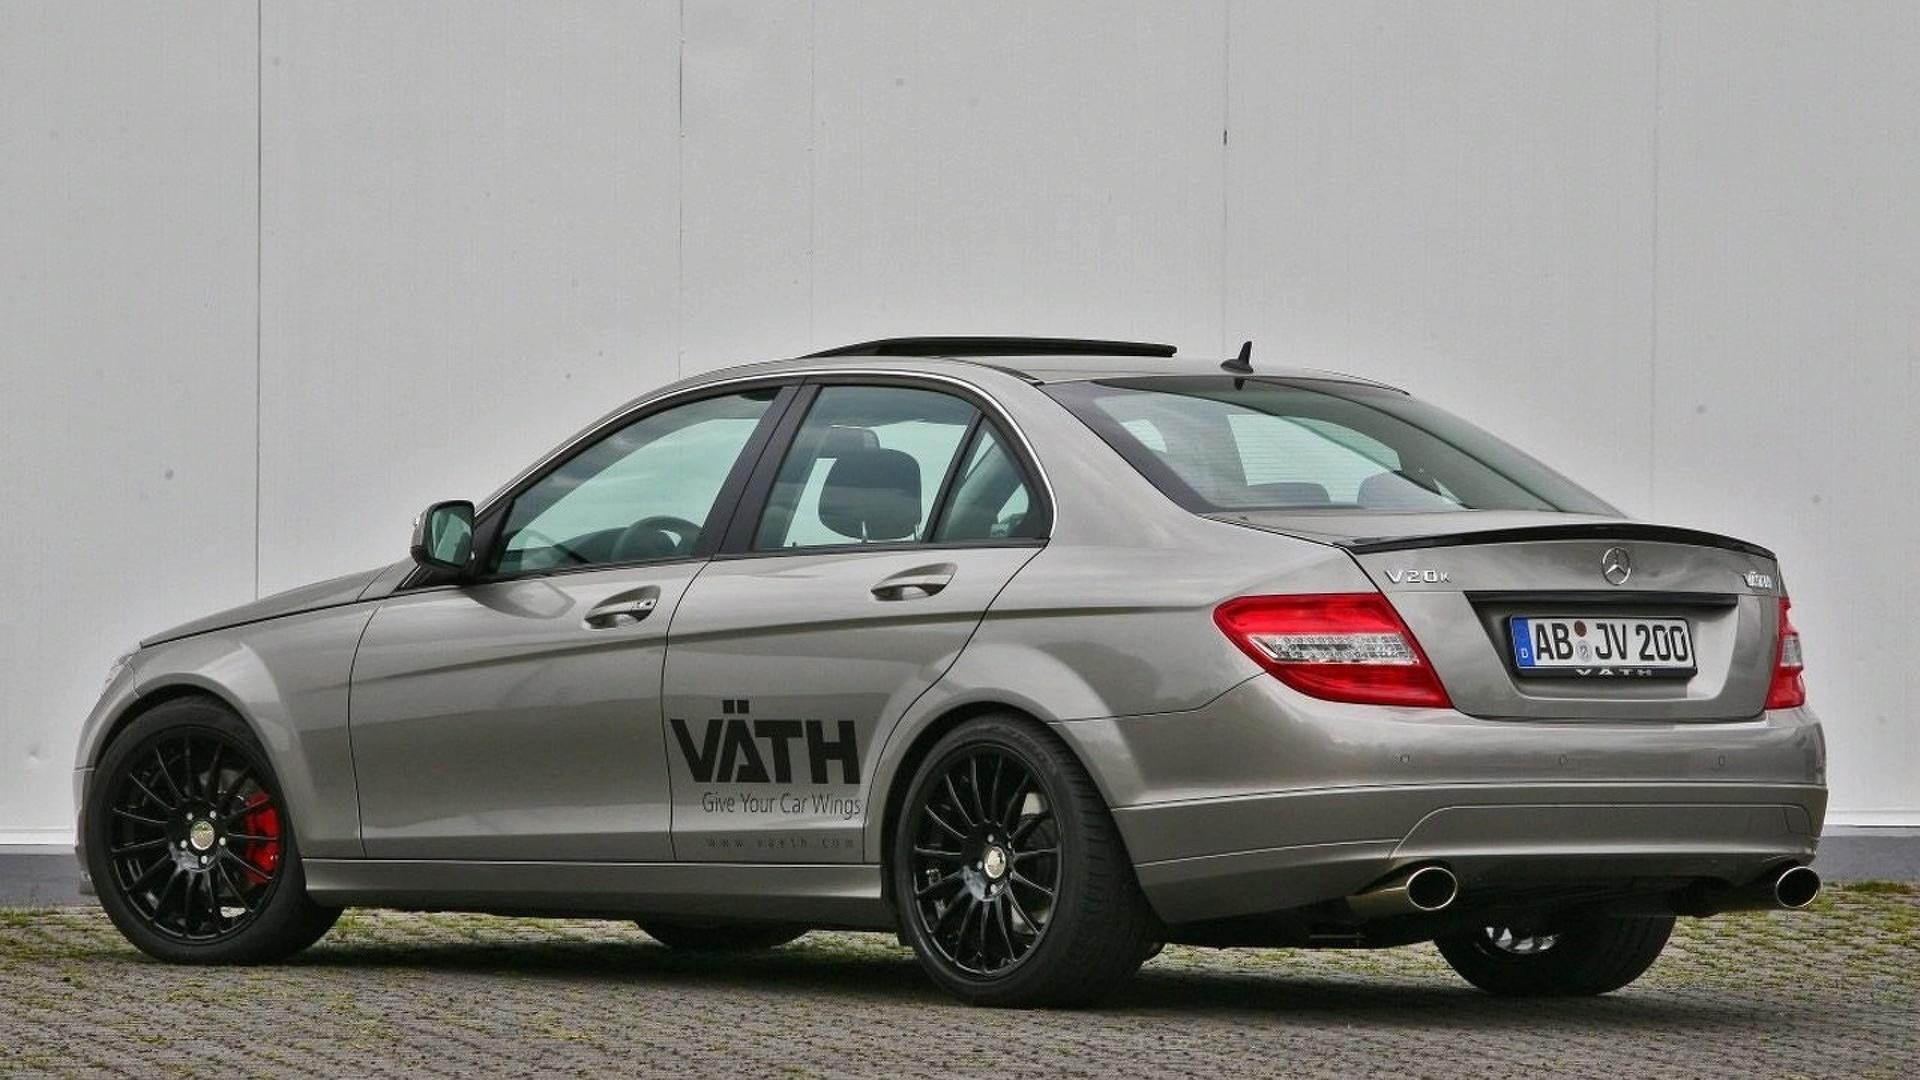 Vath V18k Mercedes Benz C Class Based On C200